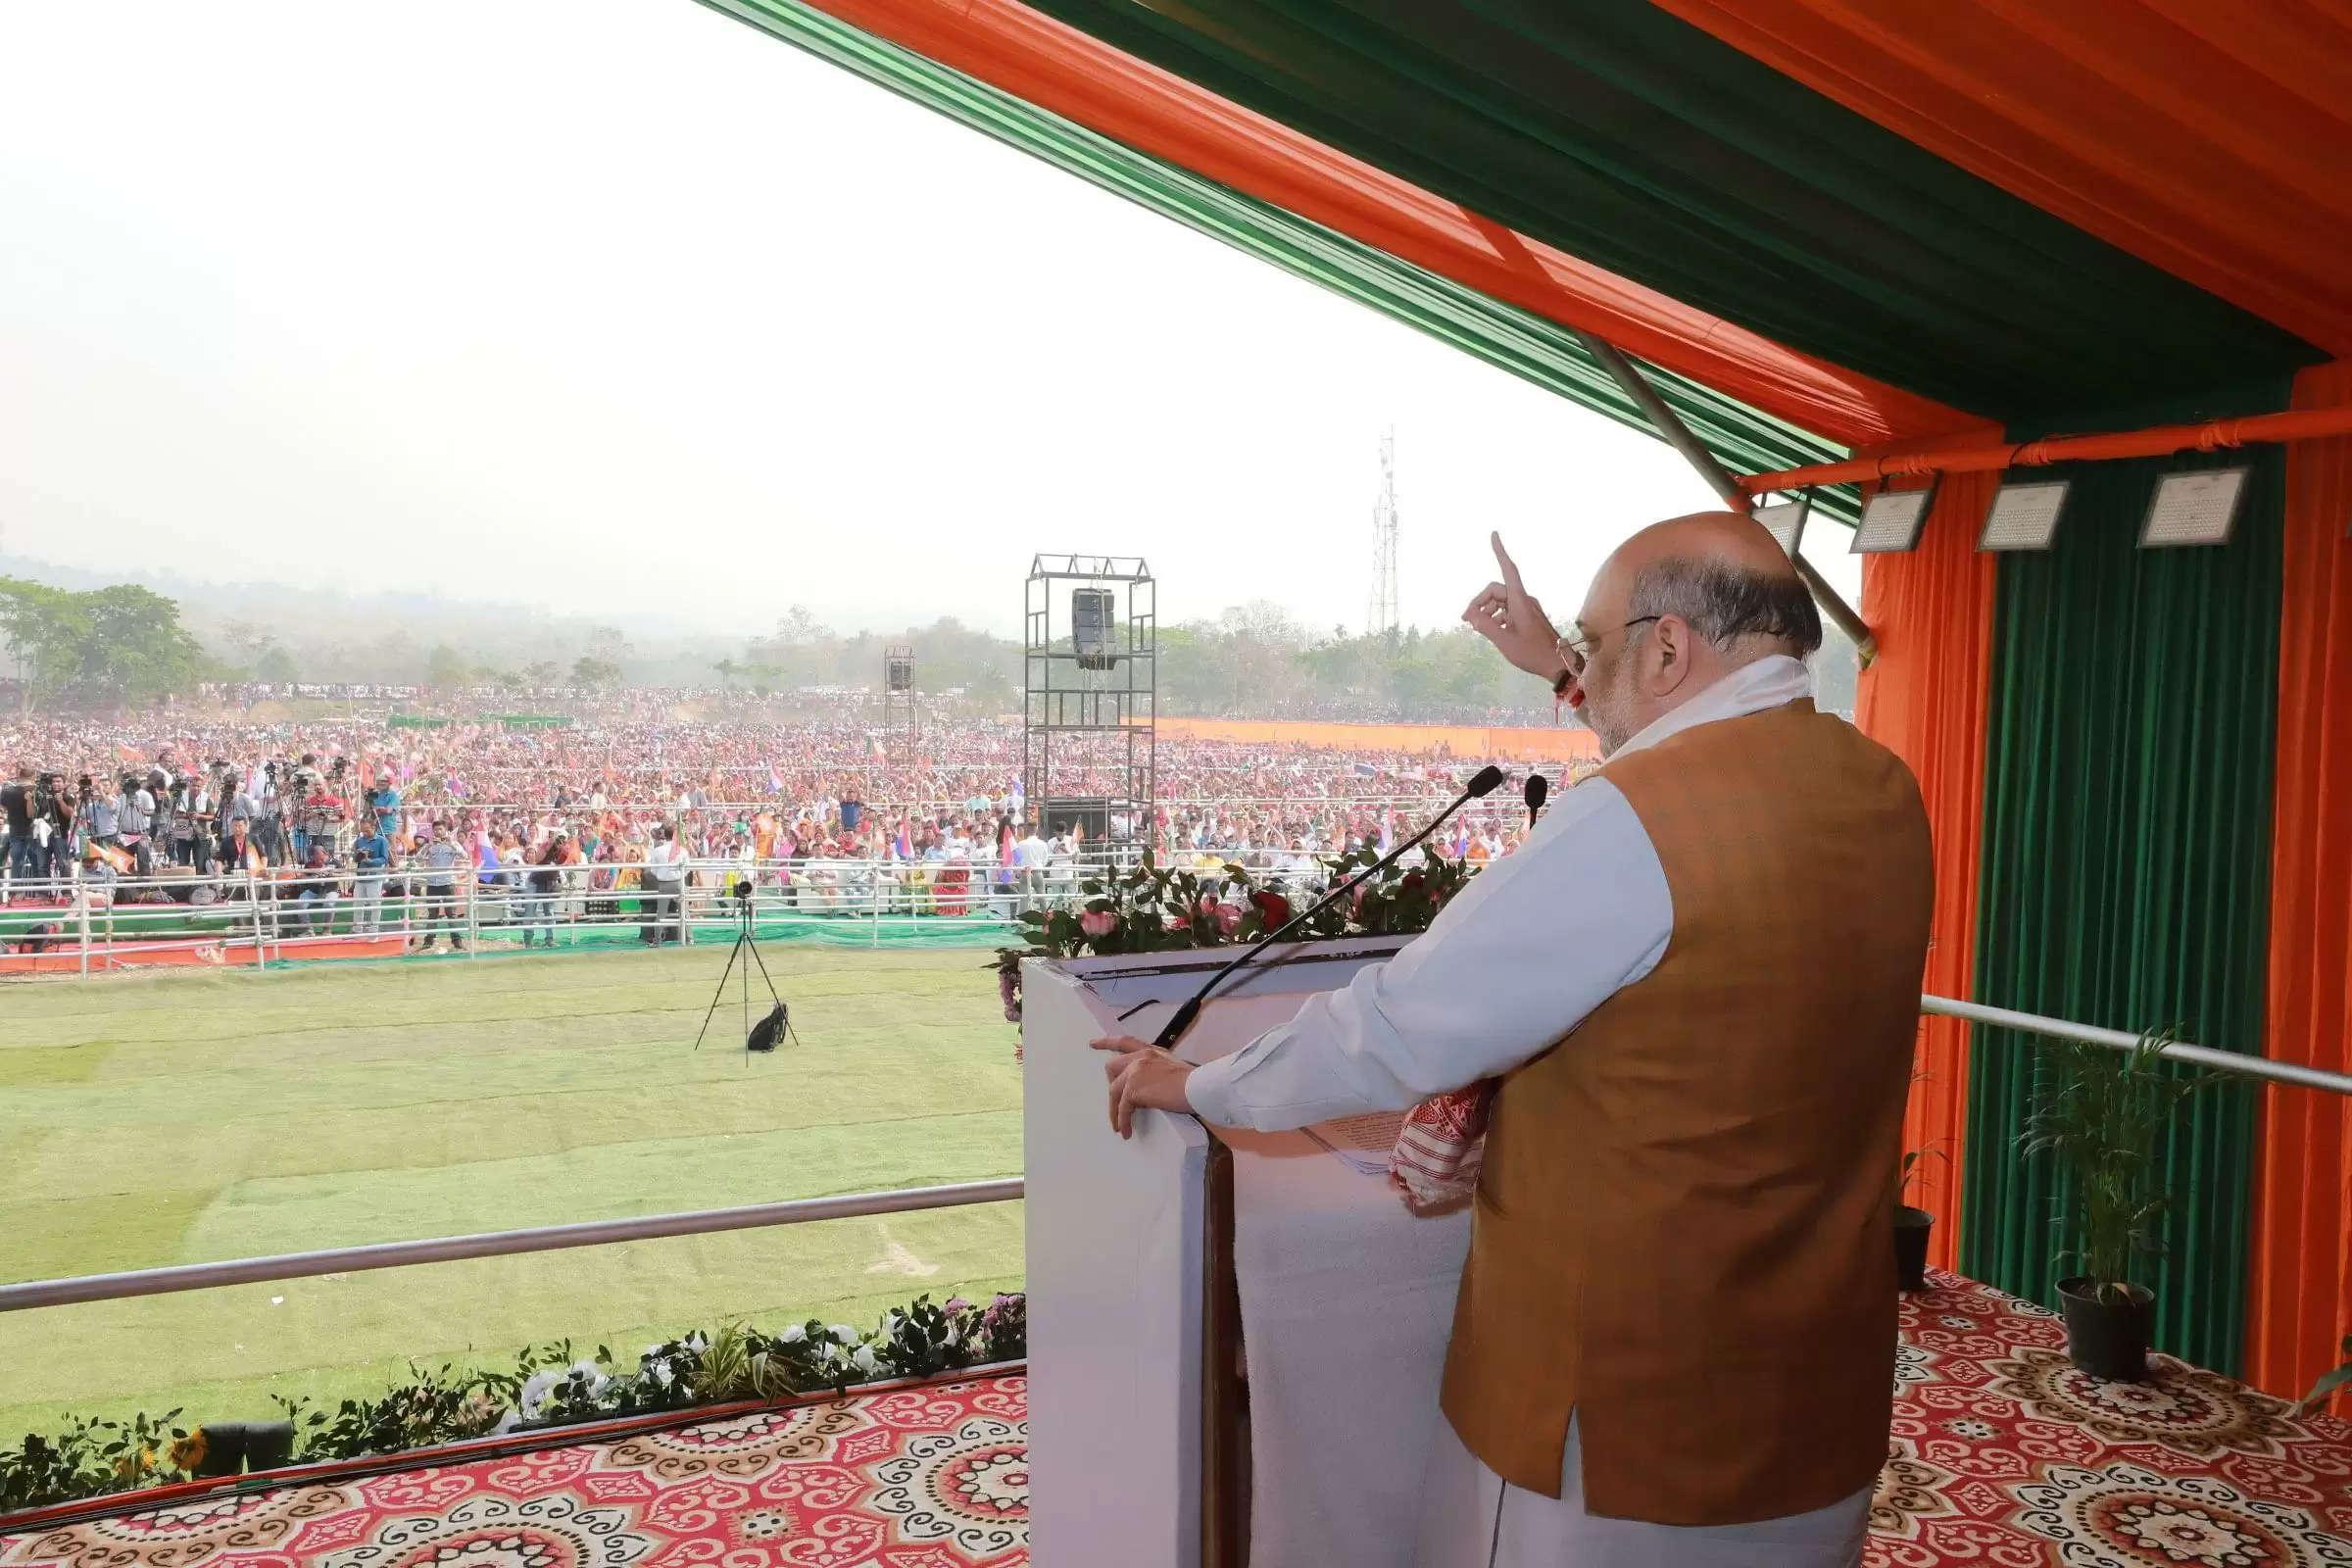 Assam Polls 2021: Will enact laws against 'land jihad', 'love jihad' in Assam, says Amit Shah